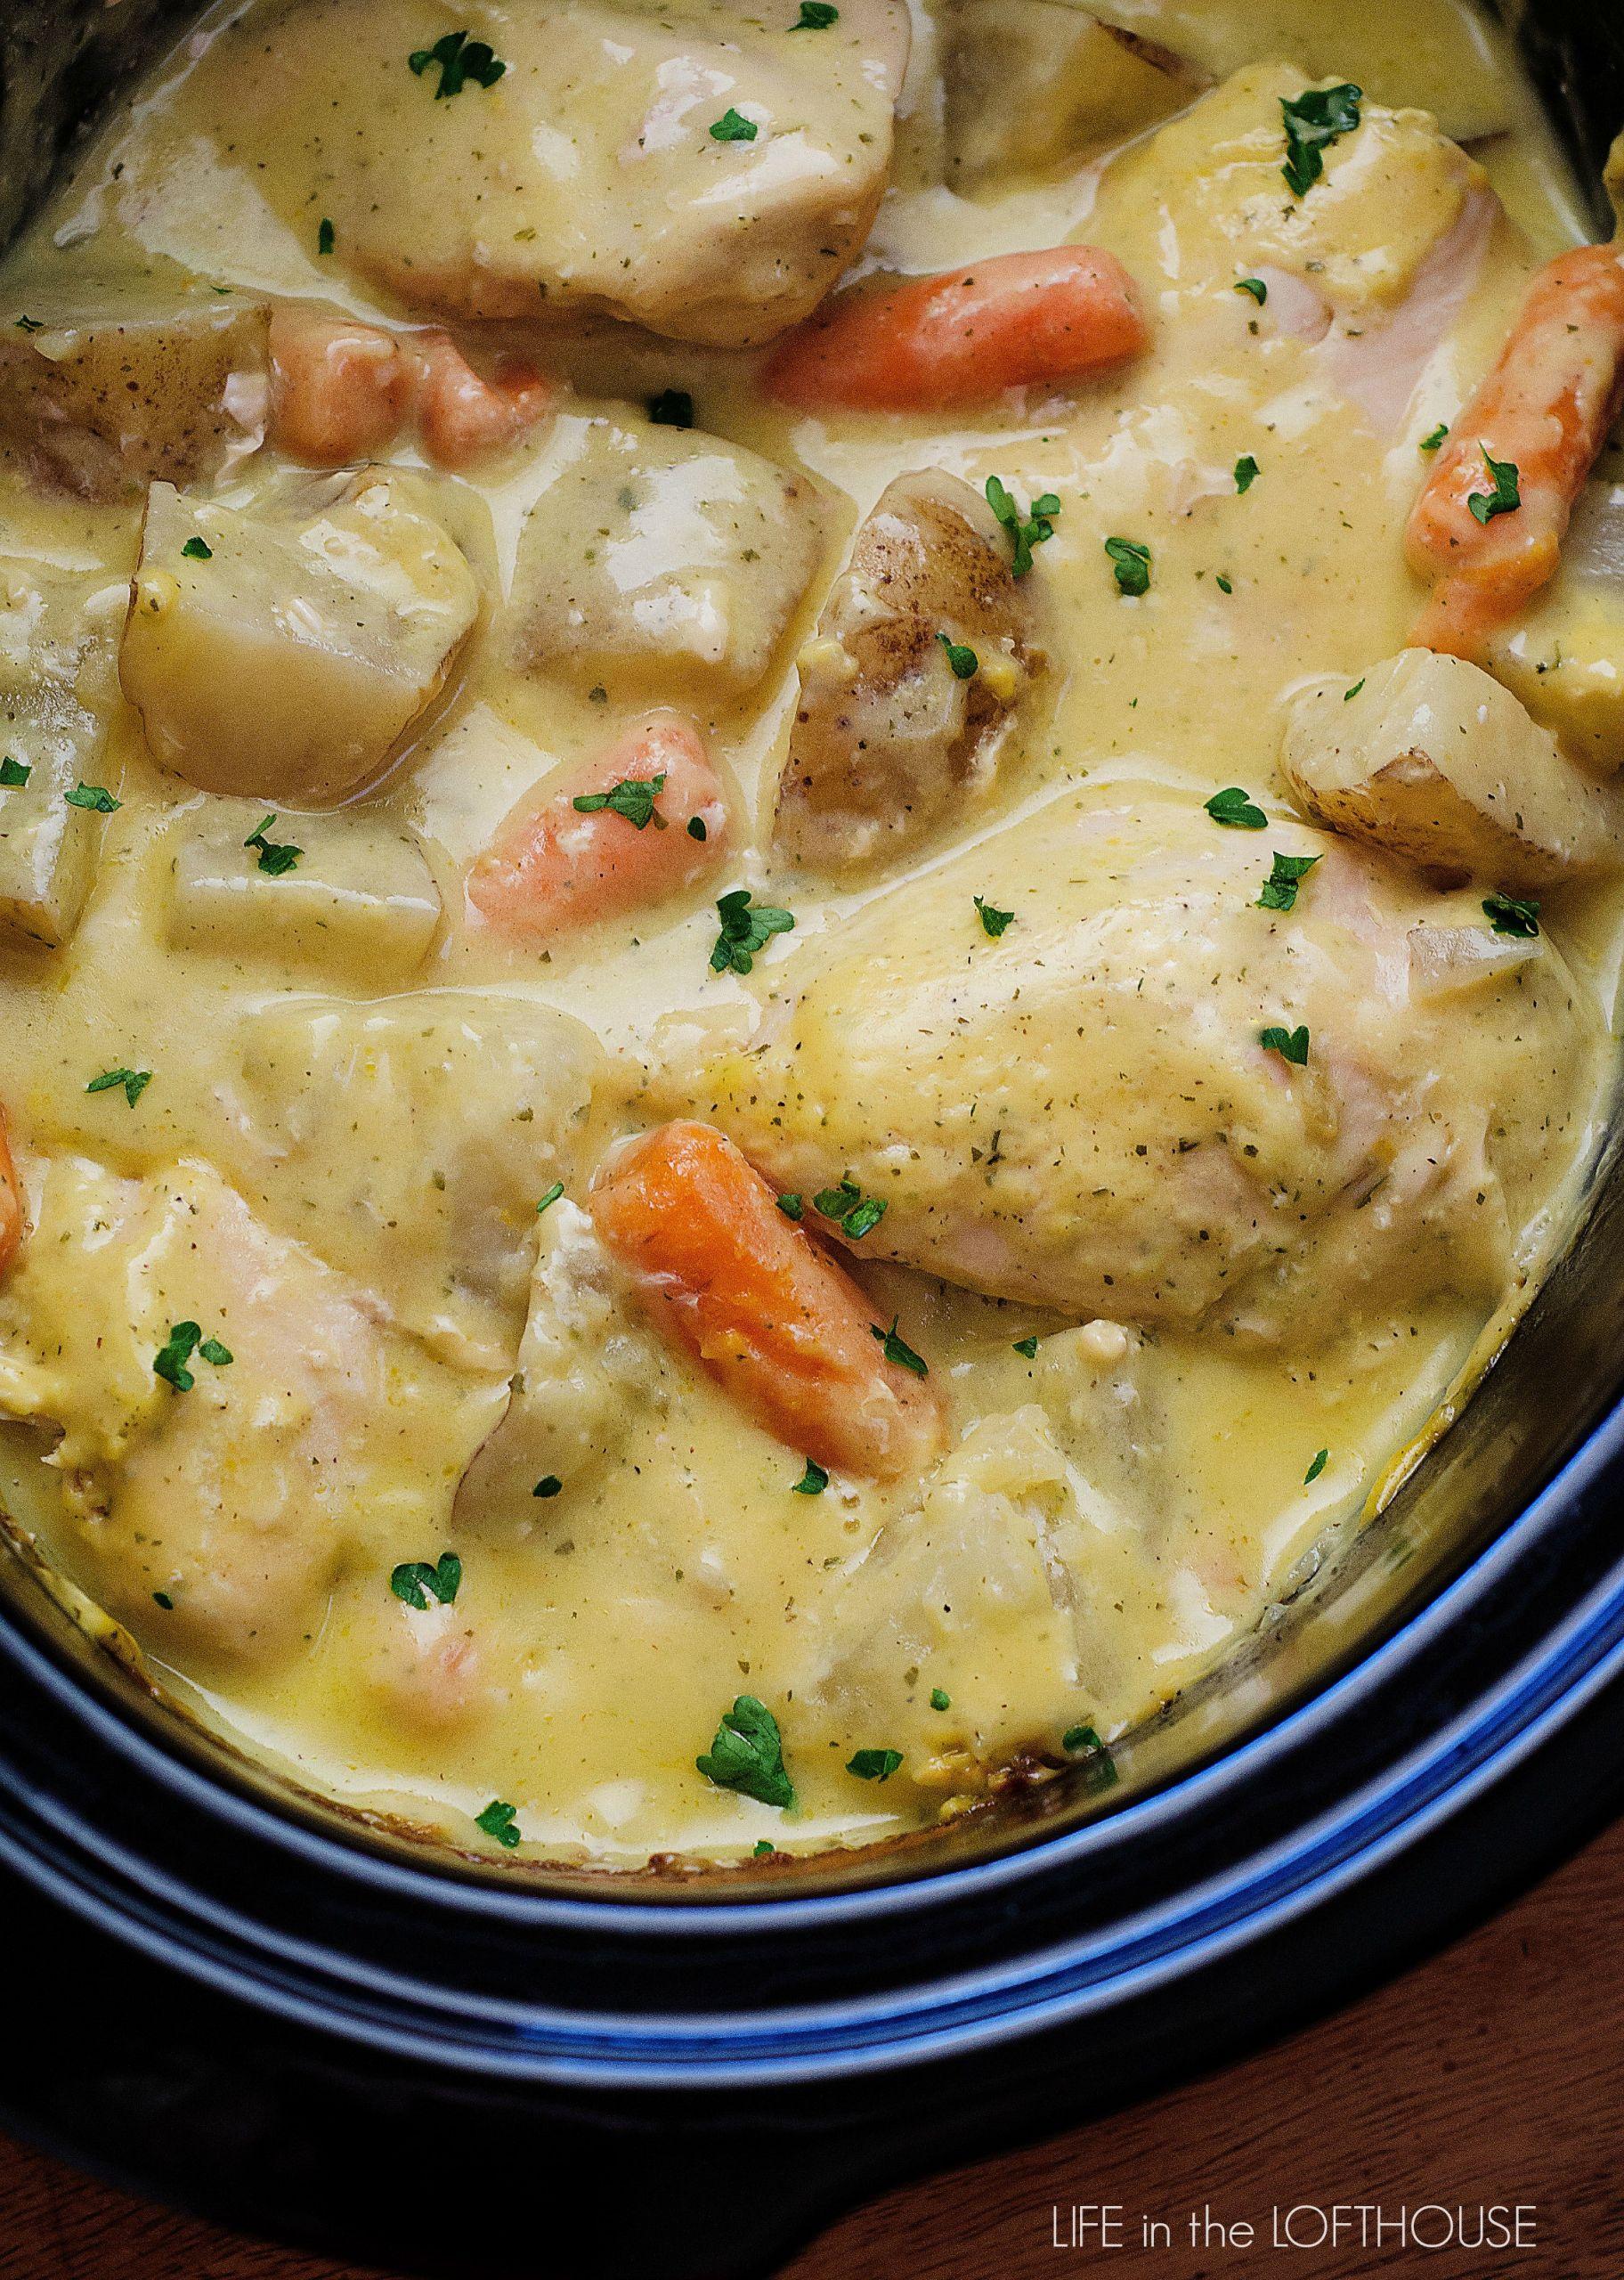 Crockpot Chicken Recipes With Cream Of Mushroom Soup  Crock Pot Creamy Ranch Chicken